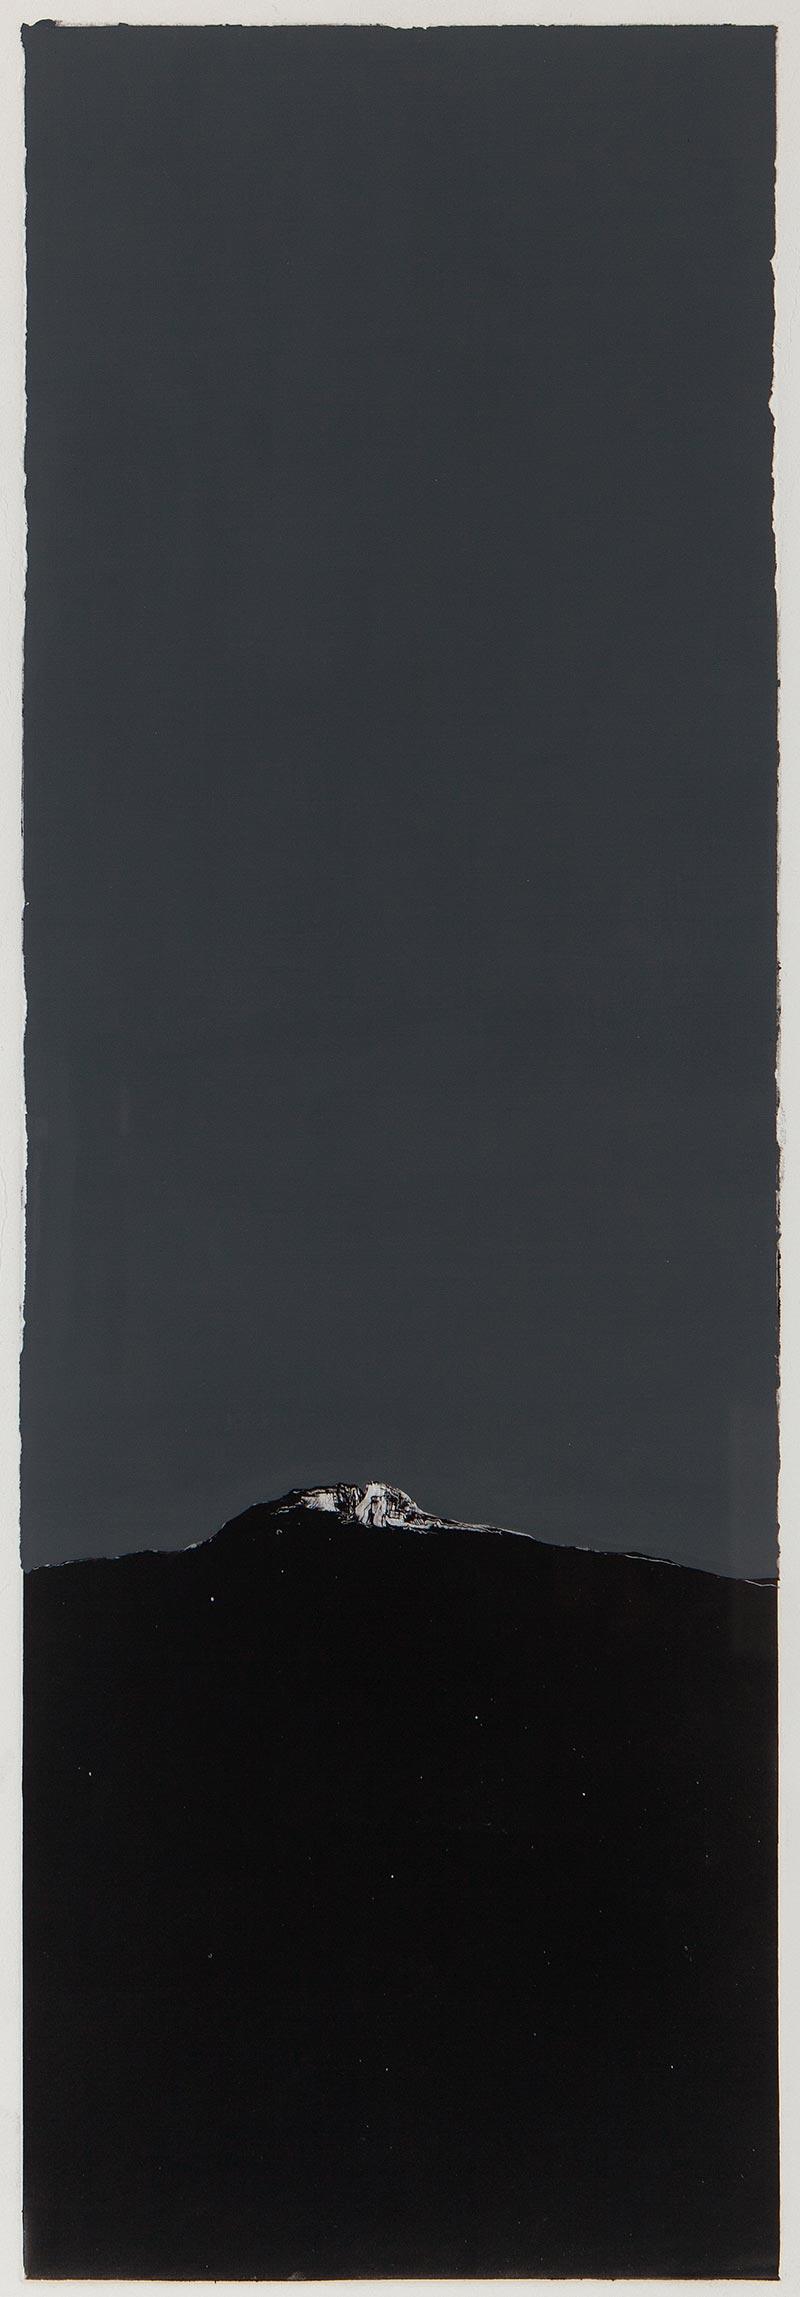 Andrew Tyler - Untitled (Grey Sky)